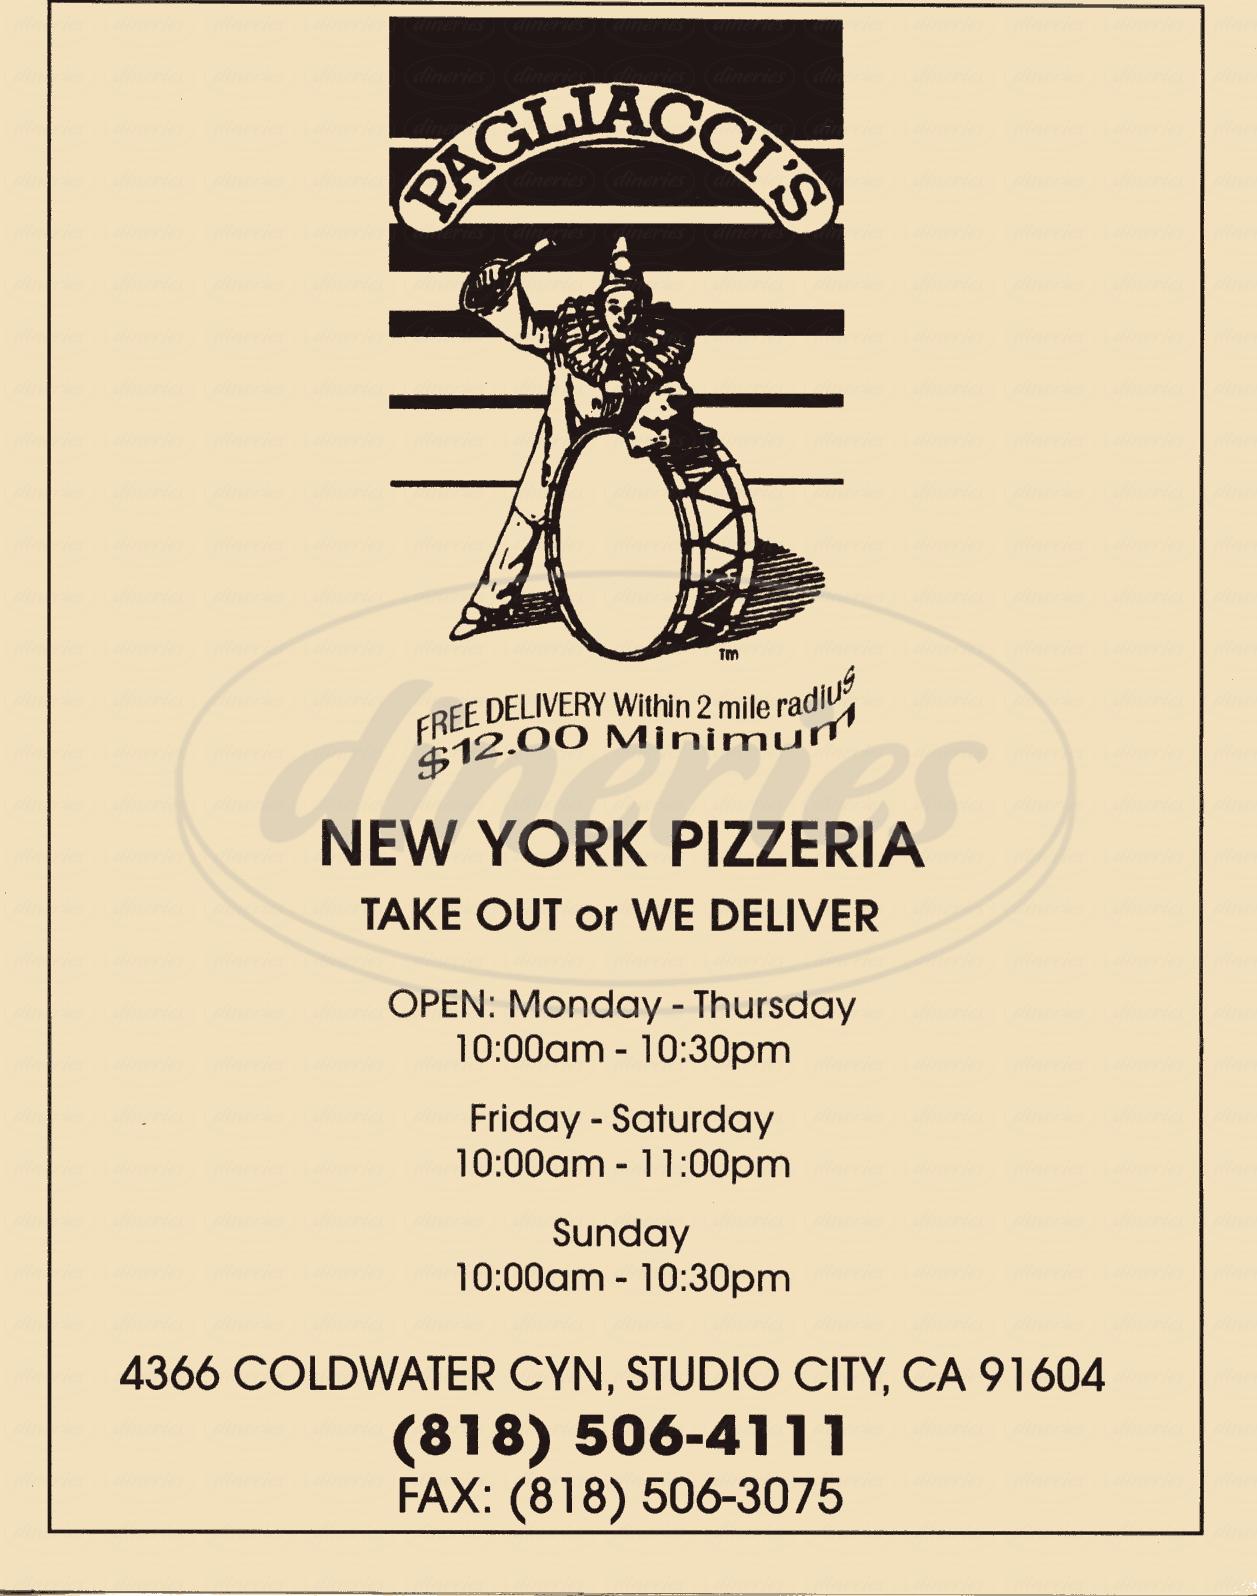 Big menu for Pagliacci's, Studio City